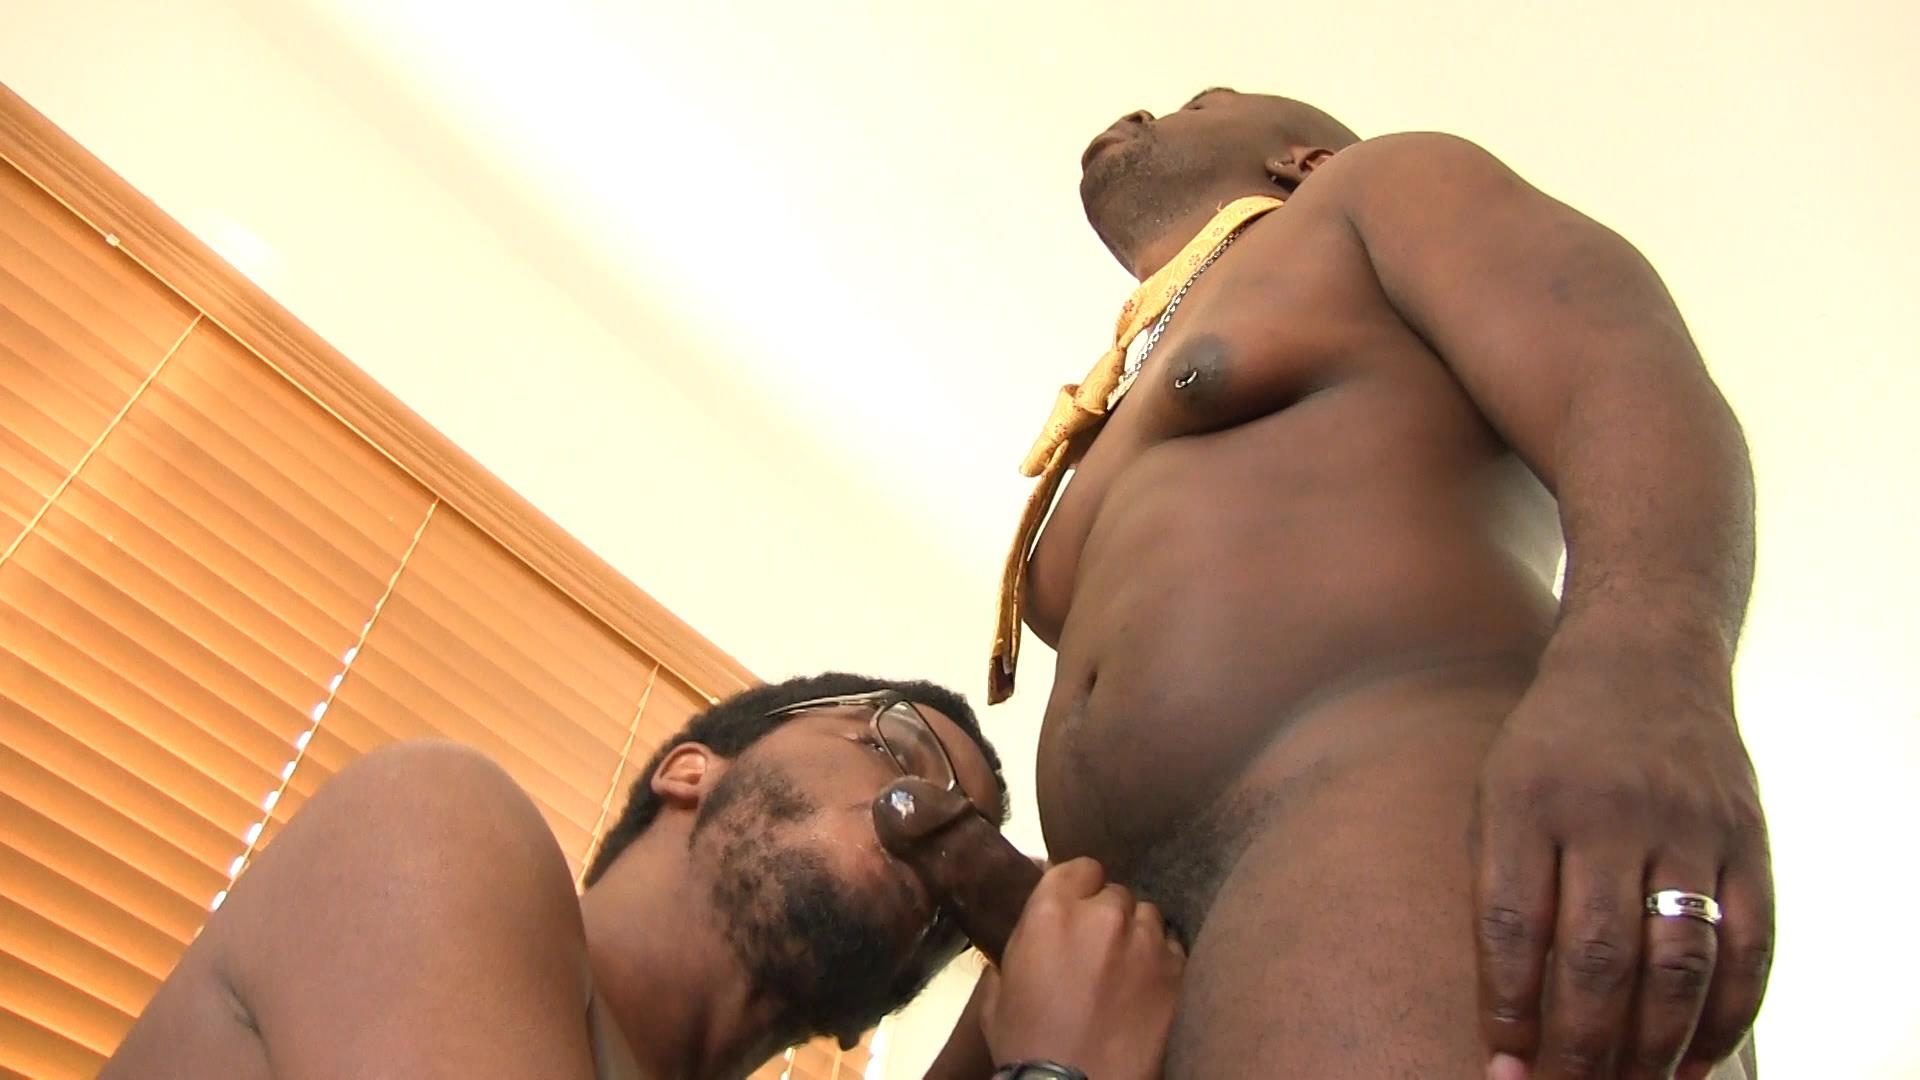 Bareback-Me-Daddy-Daemon-Sadi-and-Donny-Ray-Black-Daddy-Fucking-A-Twink-Bareback-Amateur-Gay-Porn-08 Black Daddy Barebacks His Black Twink With His Big Black Dick